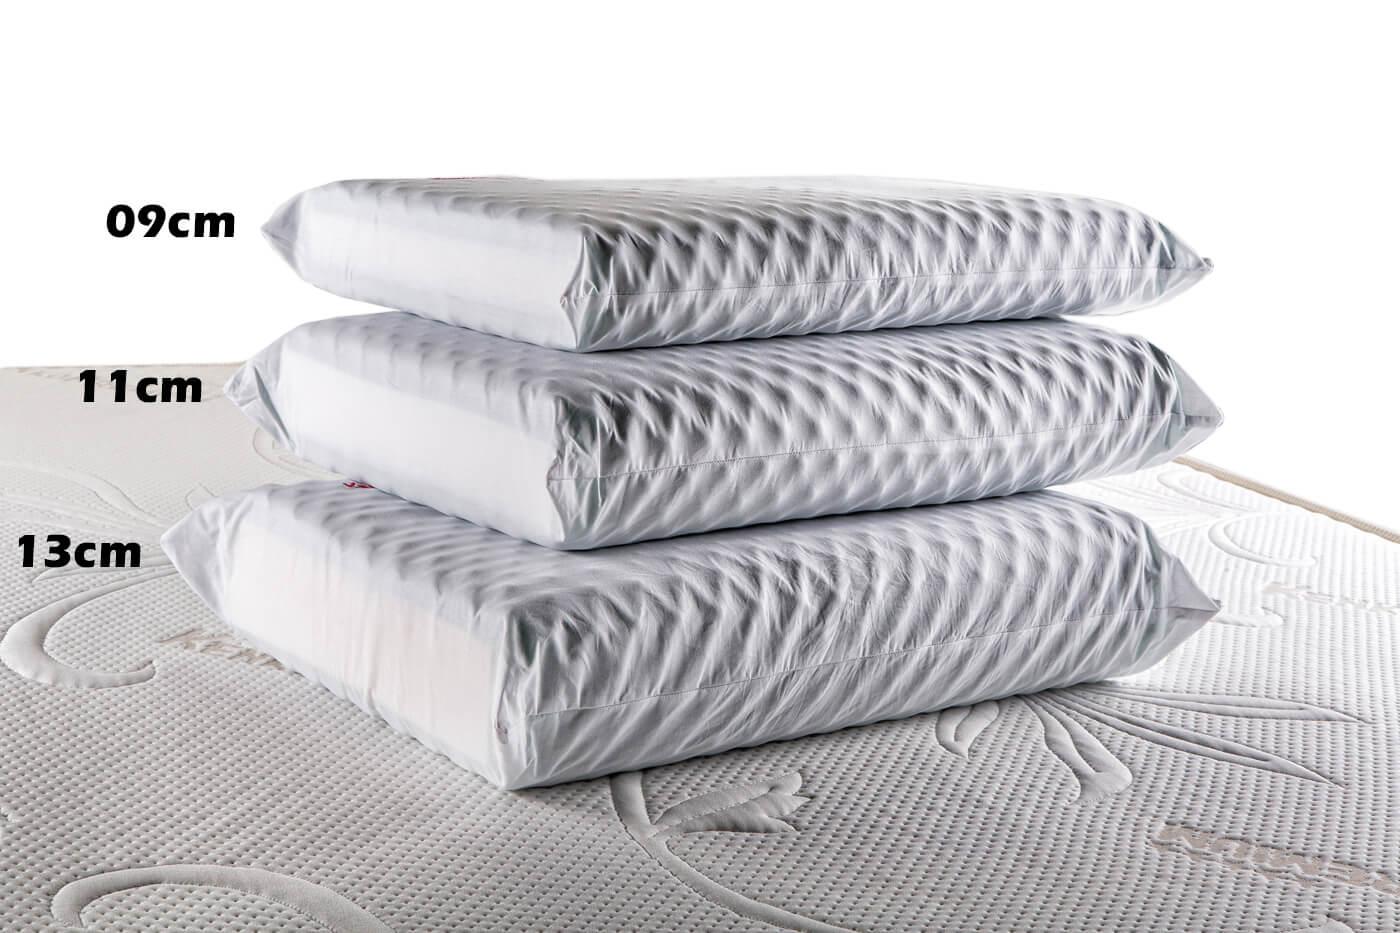 Travesseiro Magnético Luxo Reto 09cm Kenko Premium   - Kenko Premium Colchões